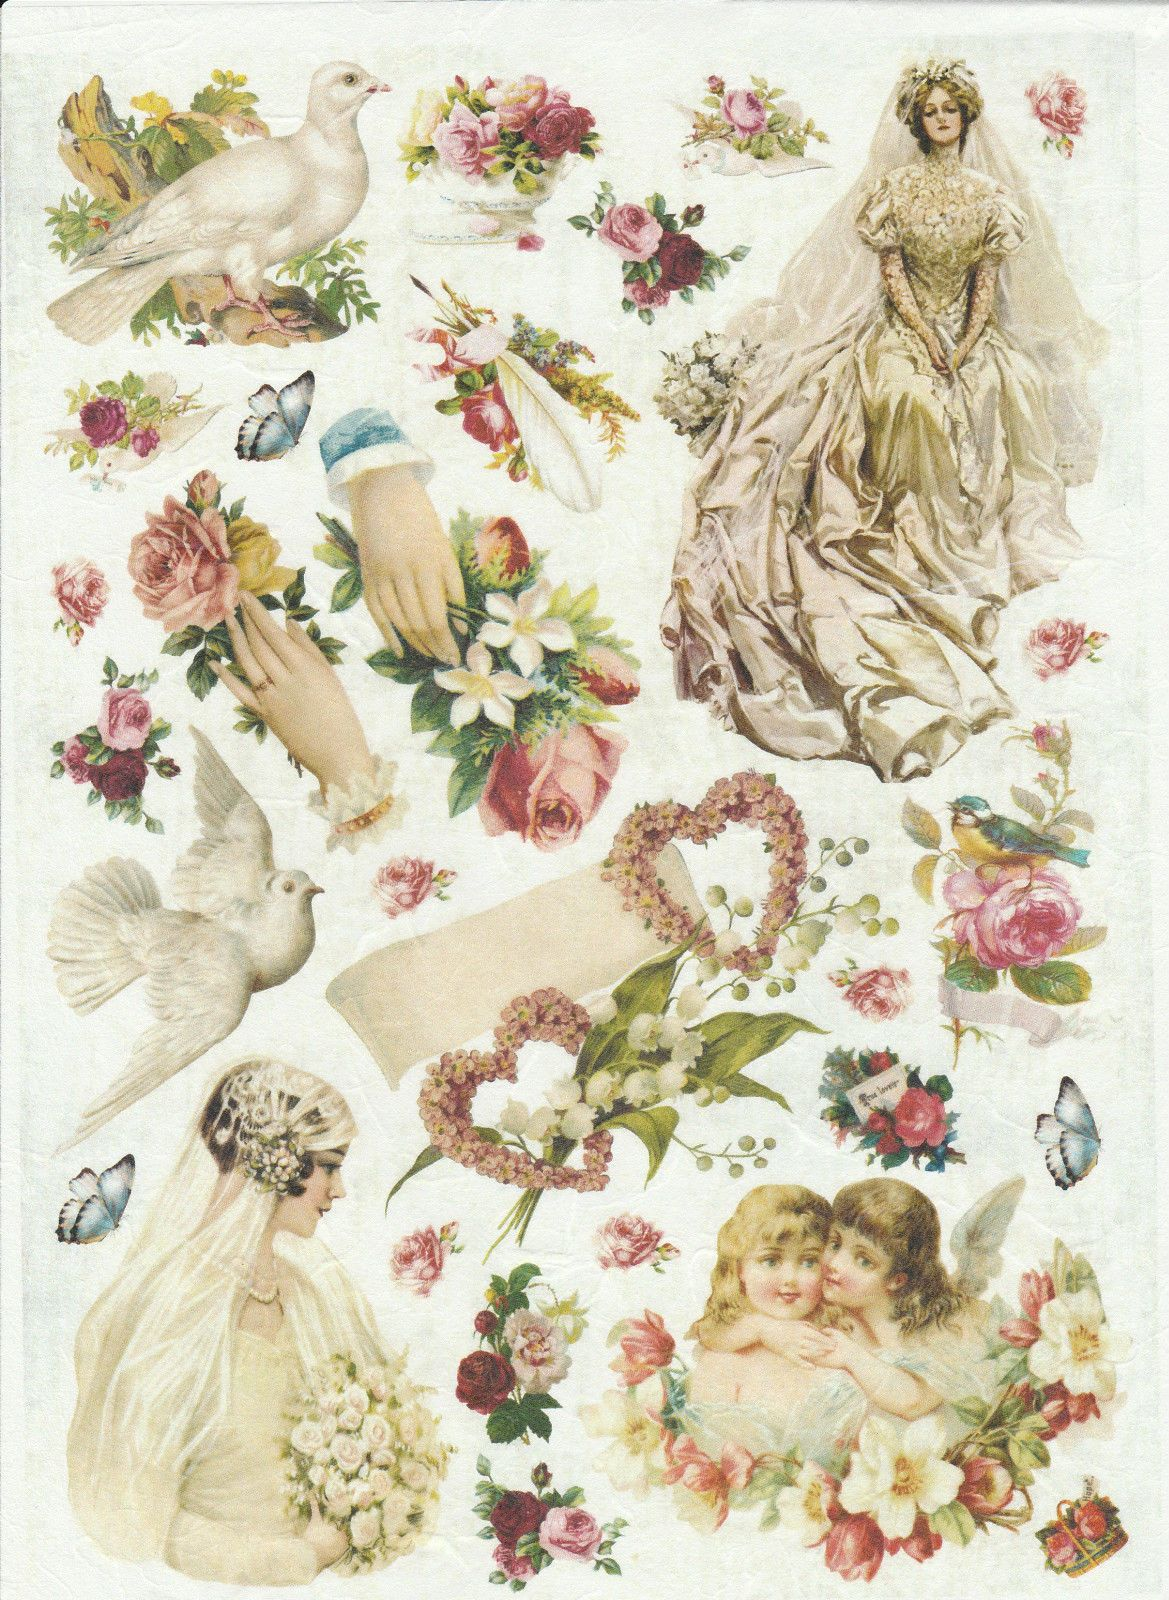 Rice Paper for Decoupage Decopatch Scrapbook Craft Sheet Vintage Wedding Love in Crafts, Cardmaking & Scrapbooking, Decoupage   eBay